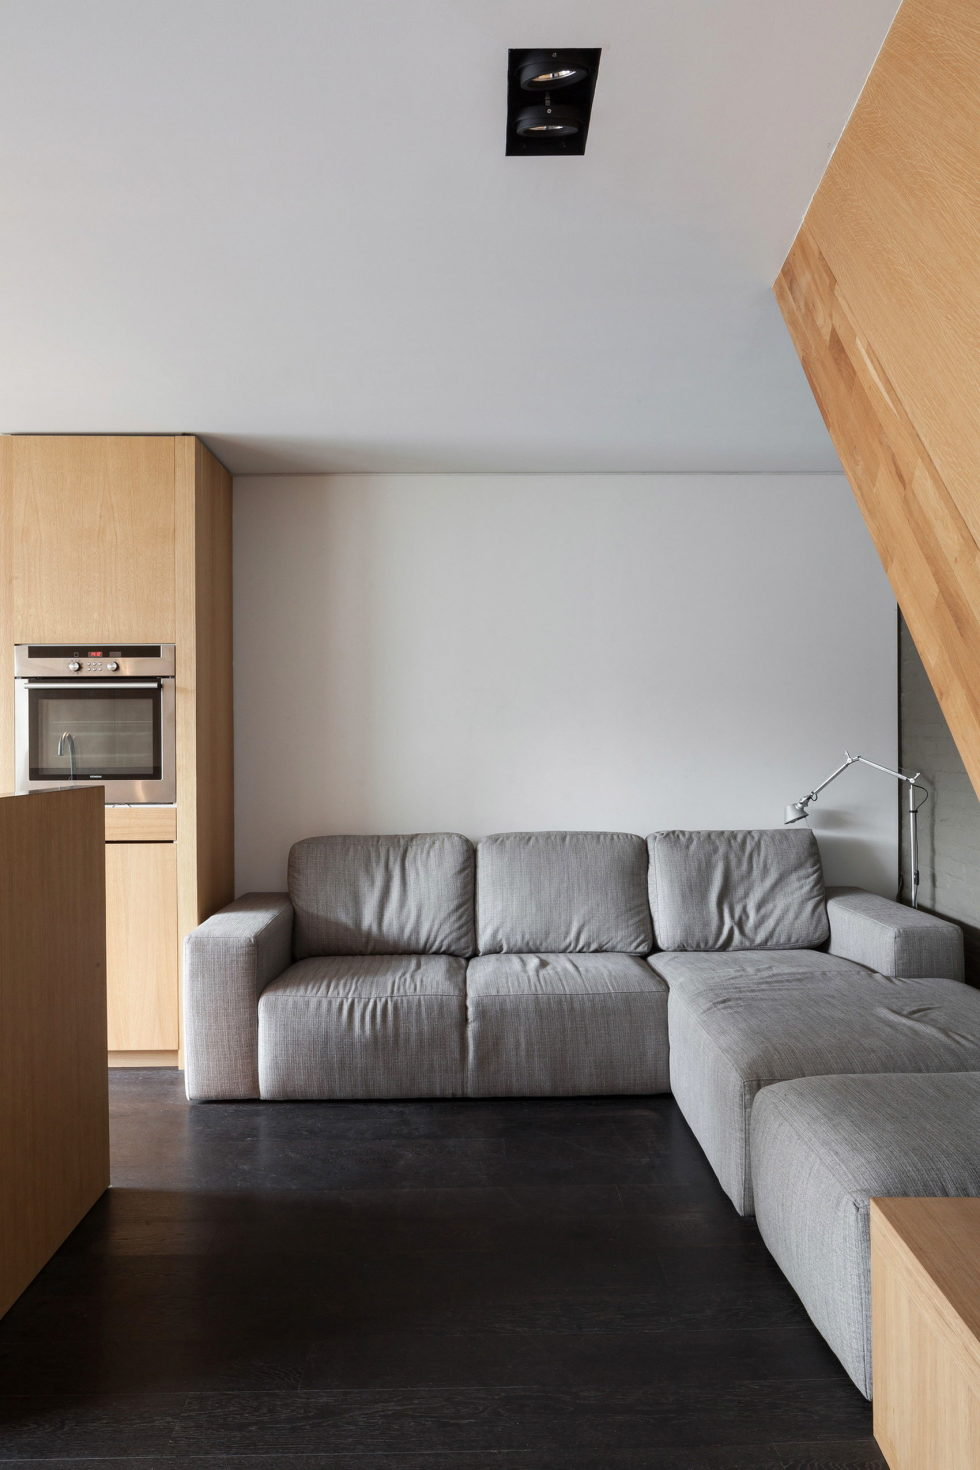 The House With Polyangular Glass Facade In Belgium 7